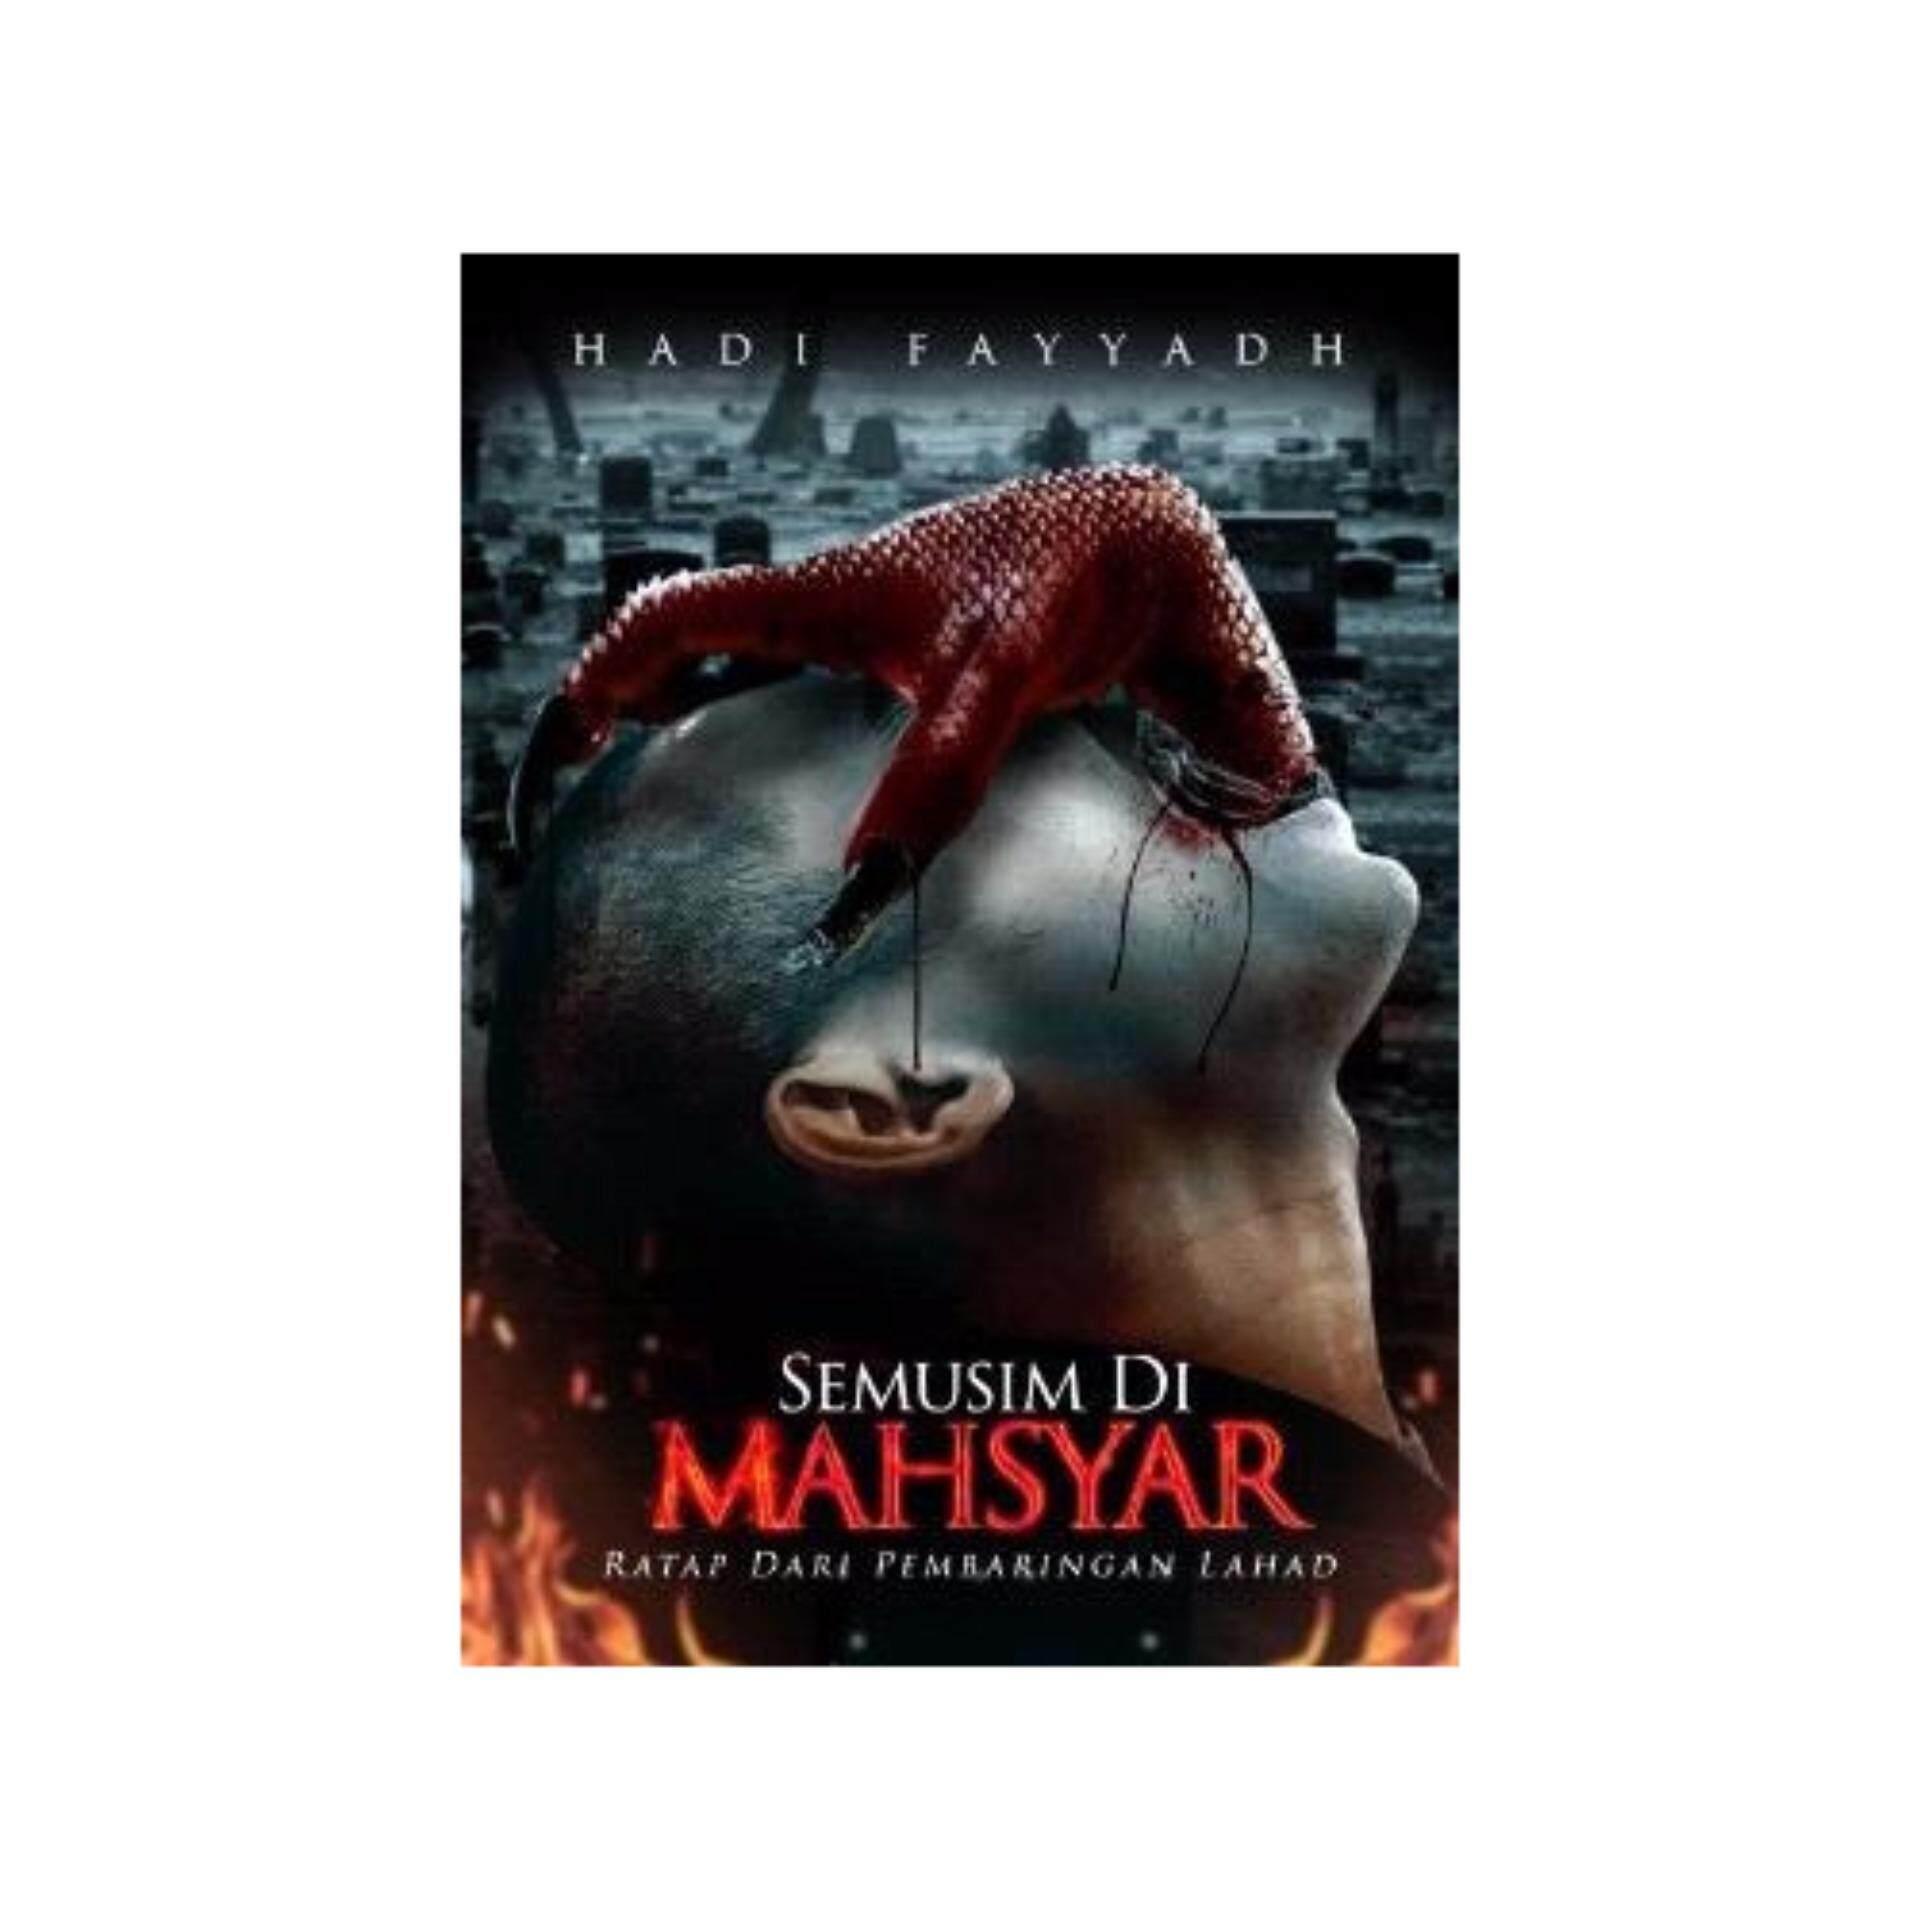 Semusim di Mahsyar - ISBN : 9789671427620 - Author Hadi Fayyadh